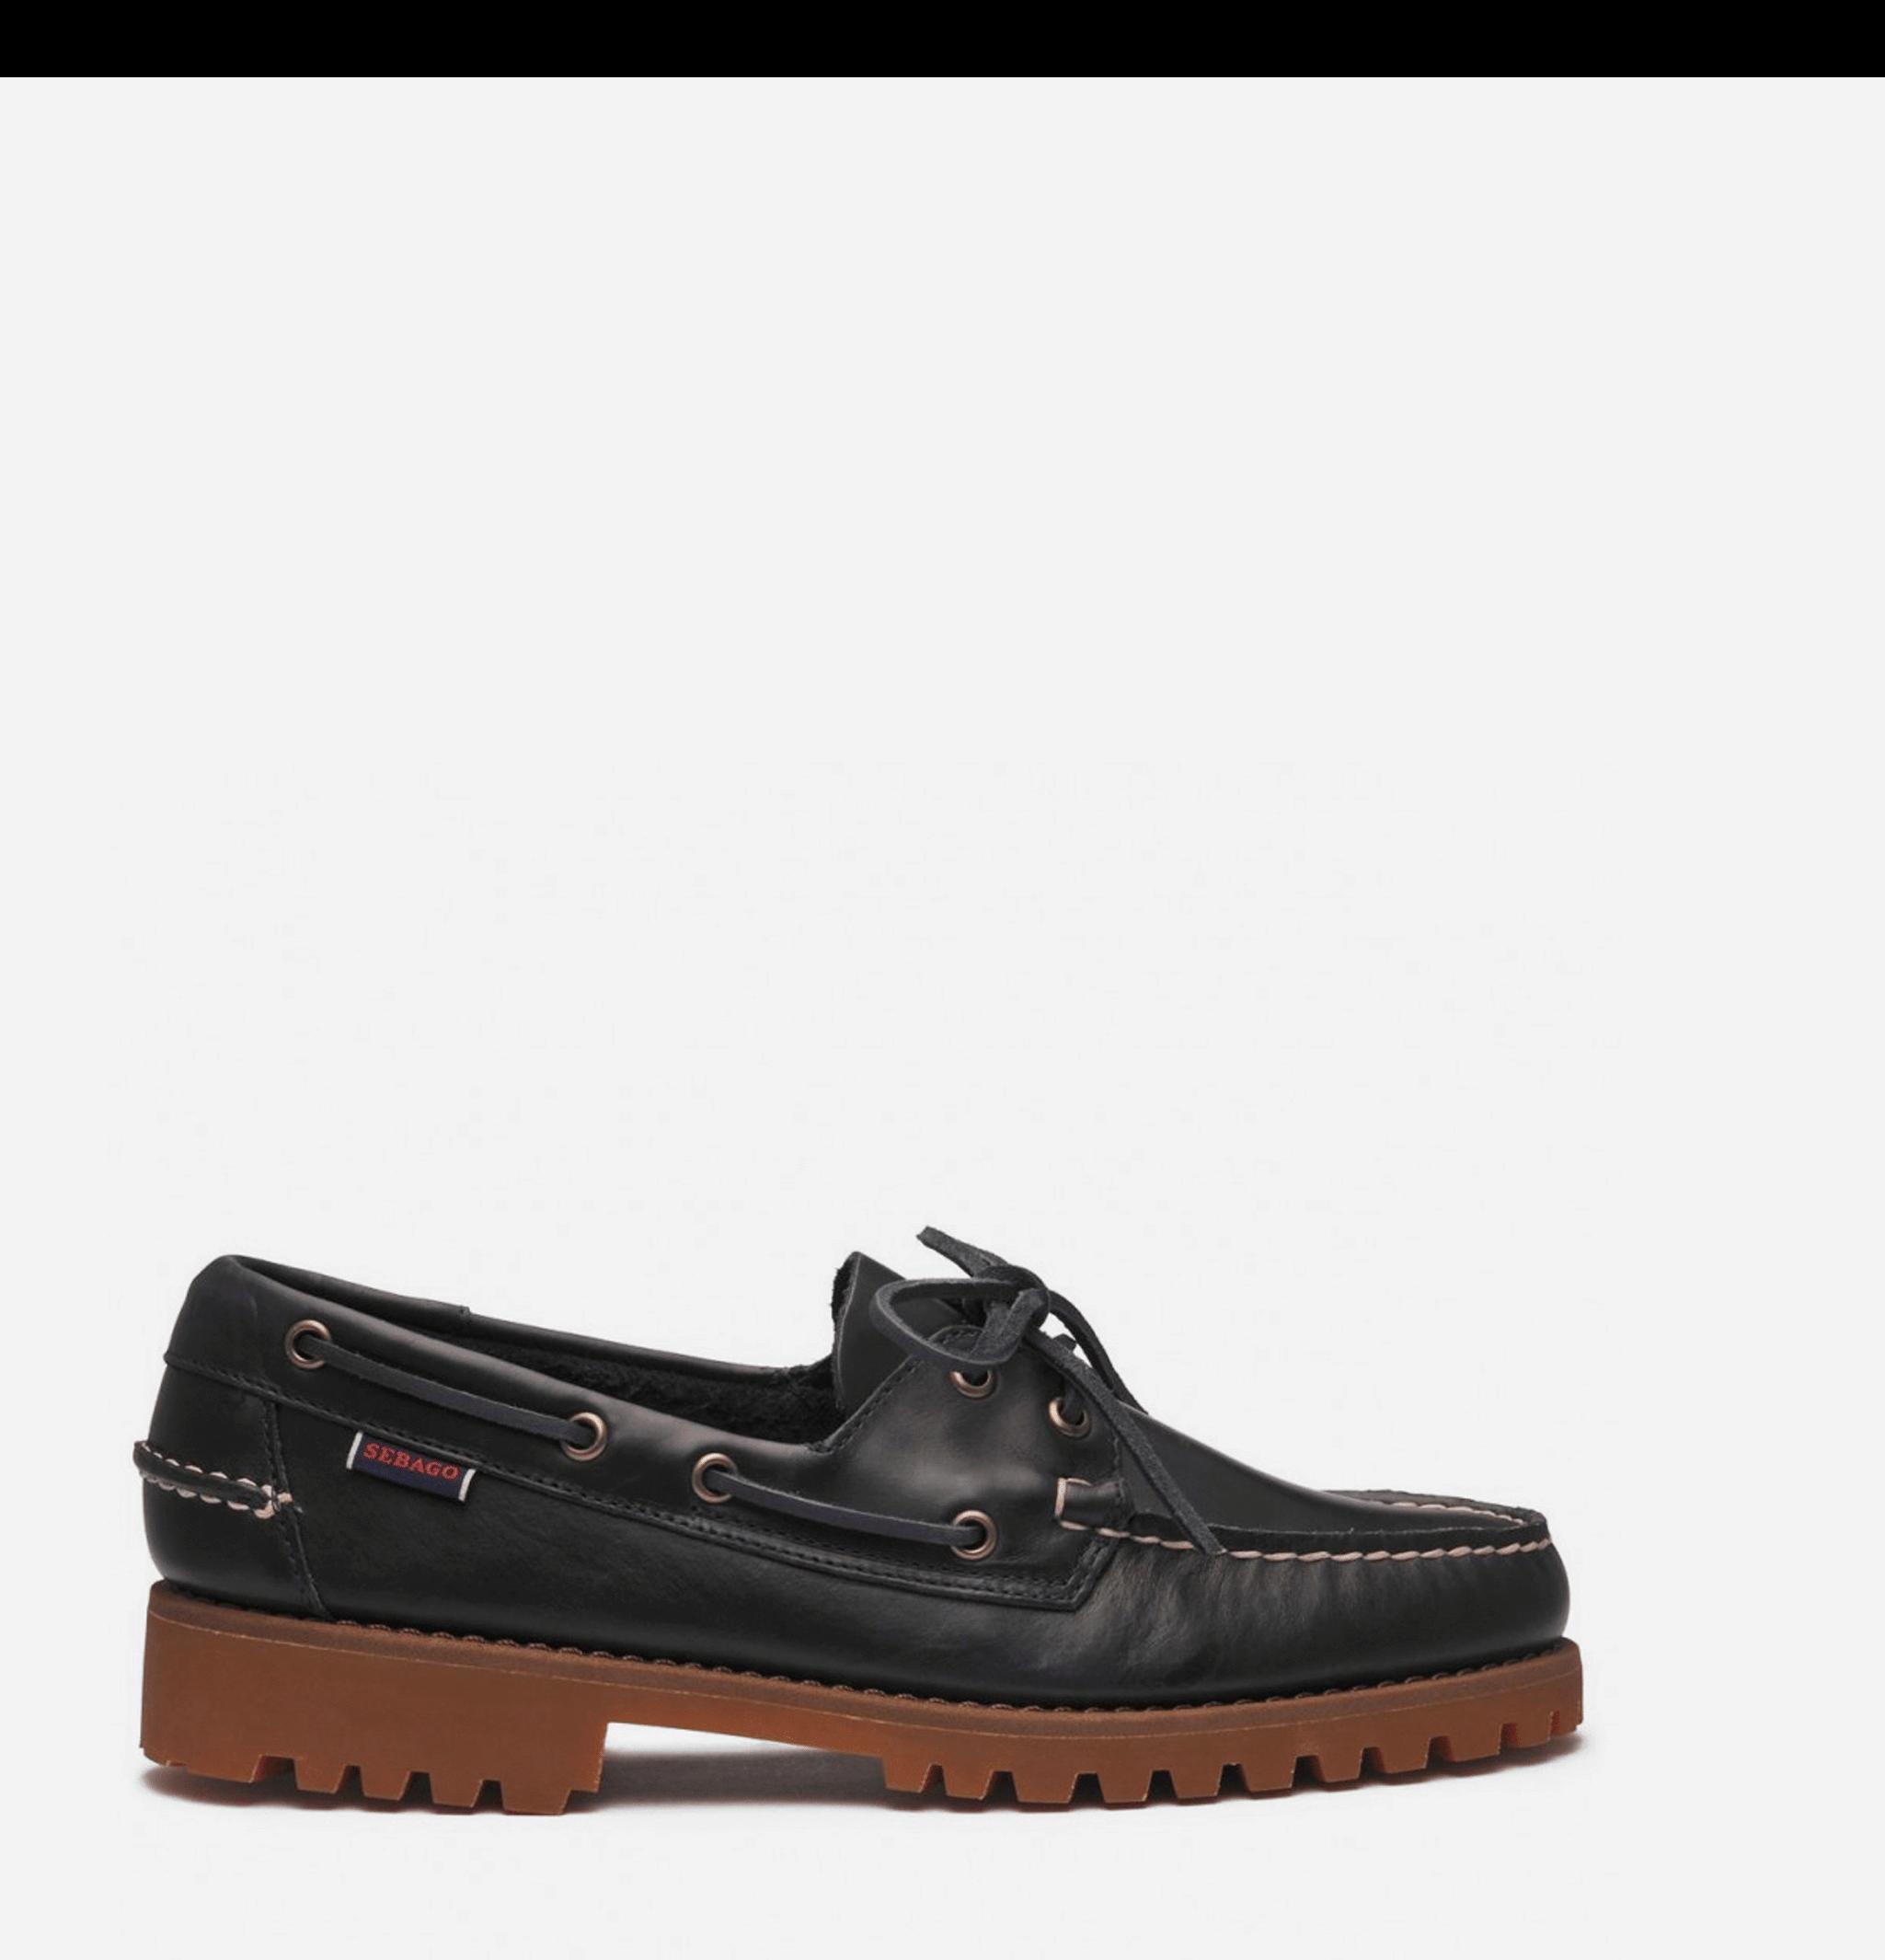 Millerain Shoes Navy